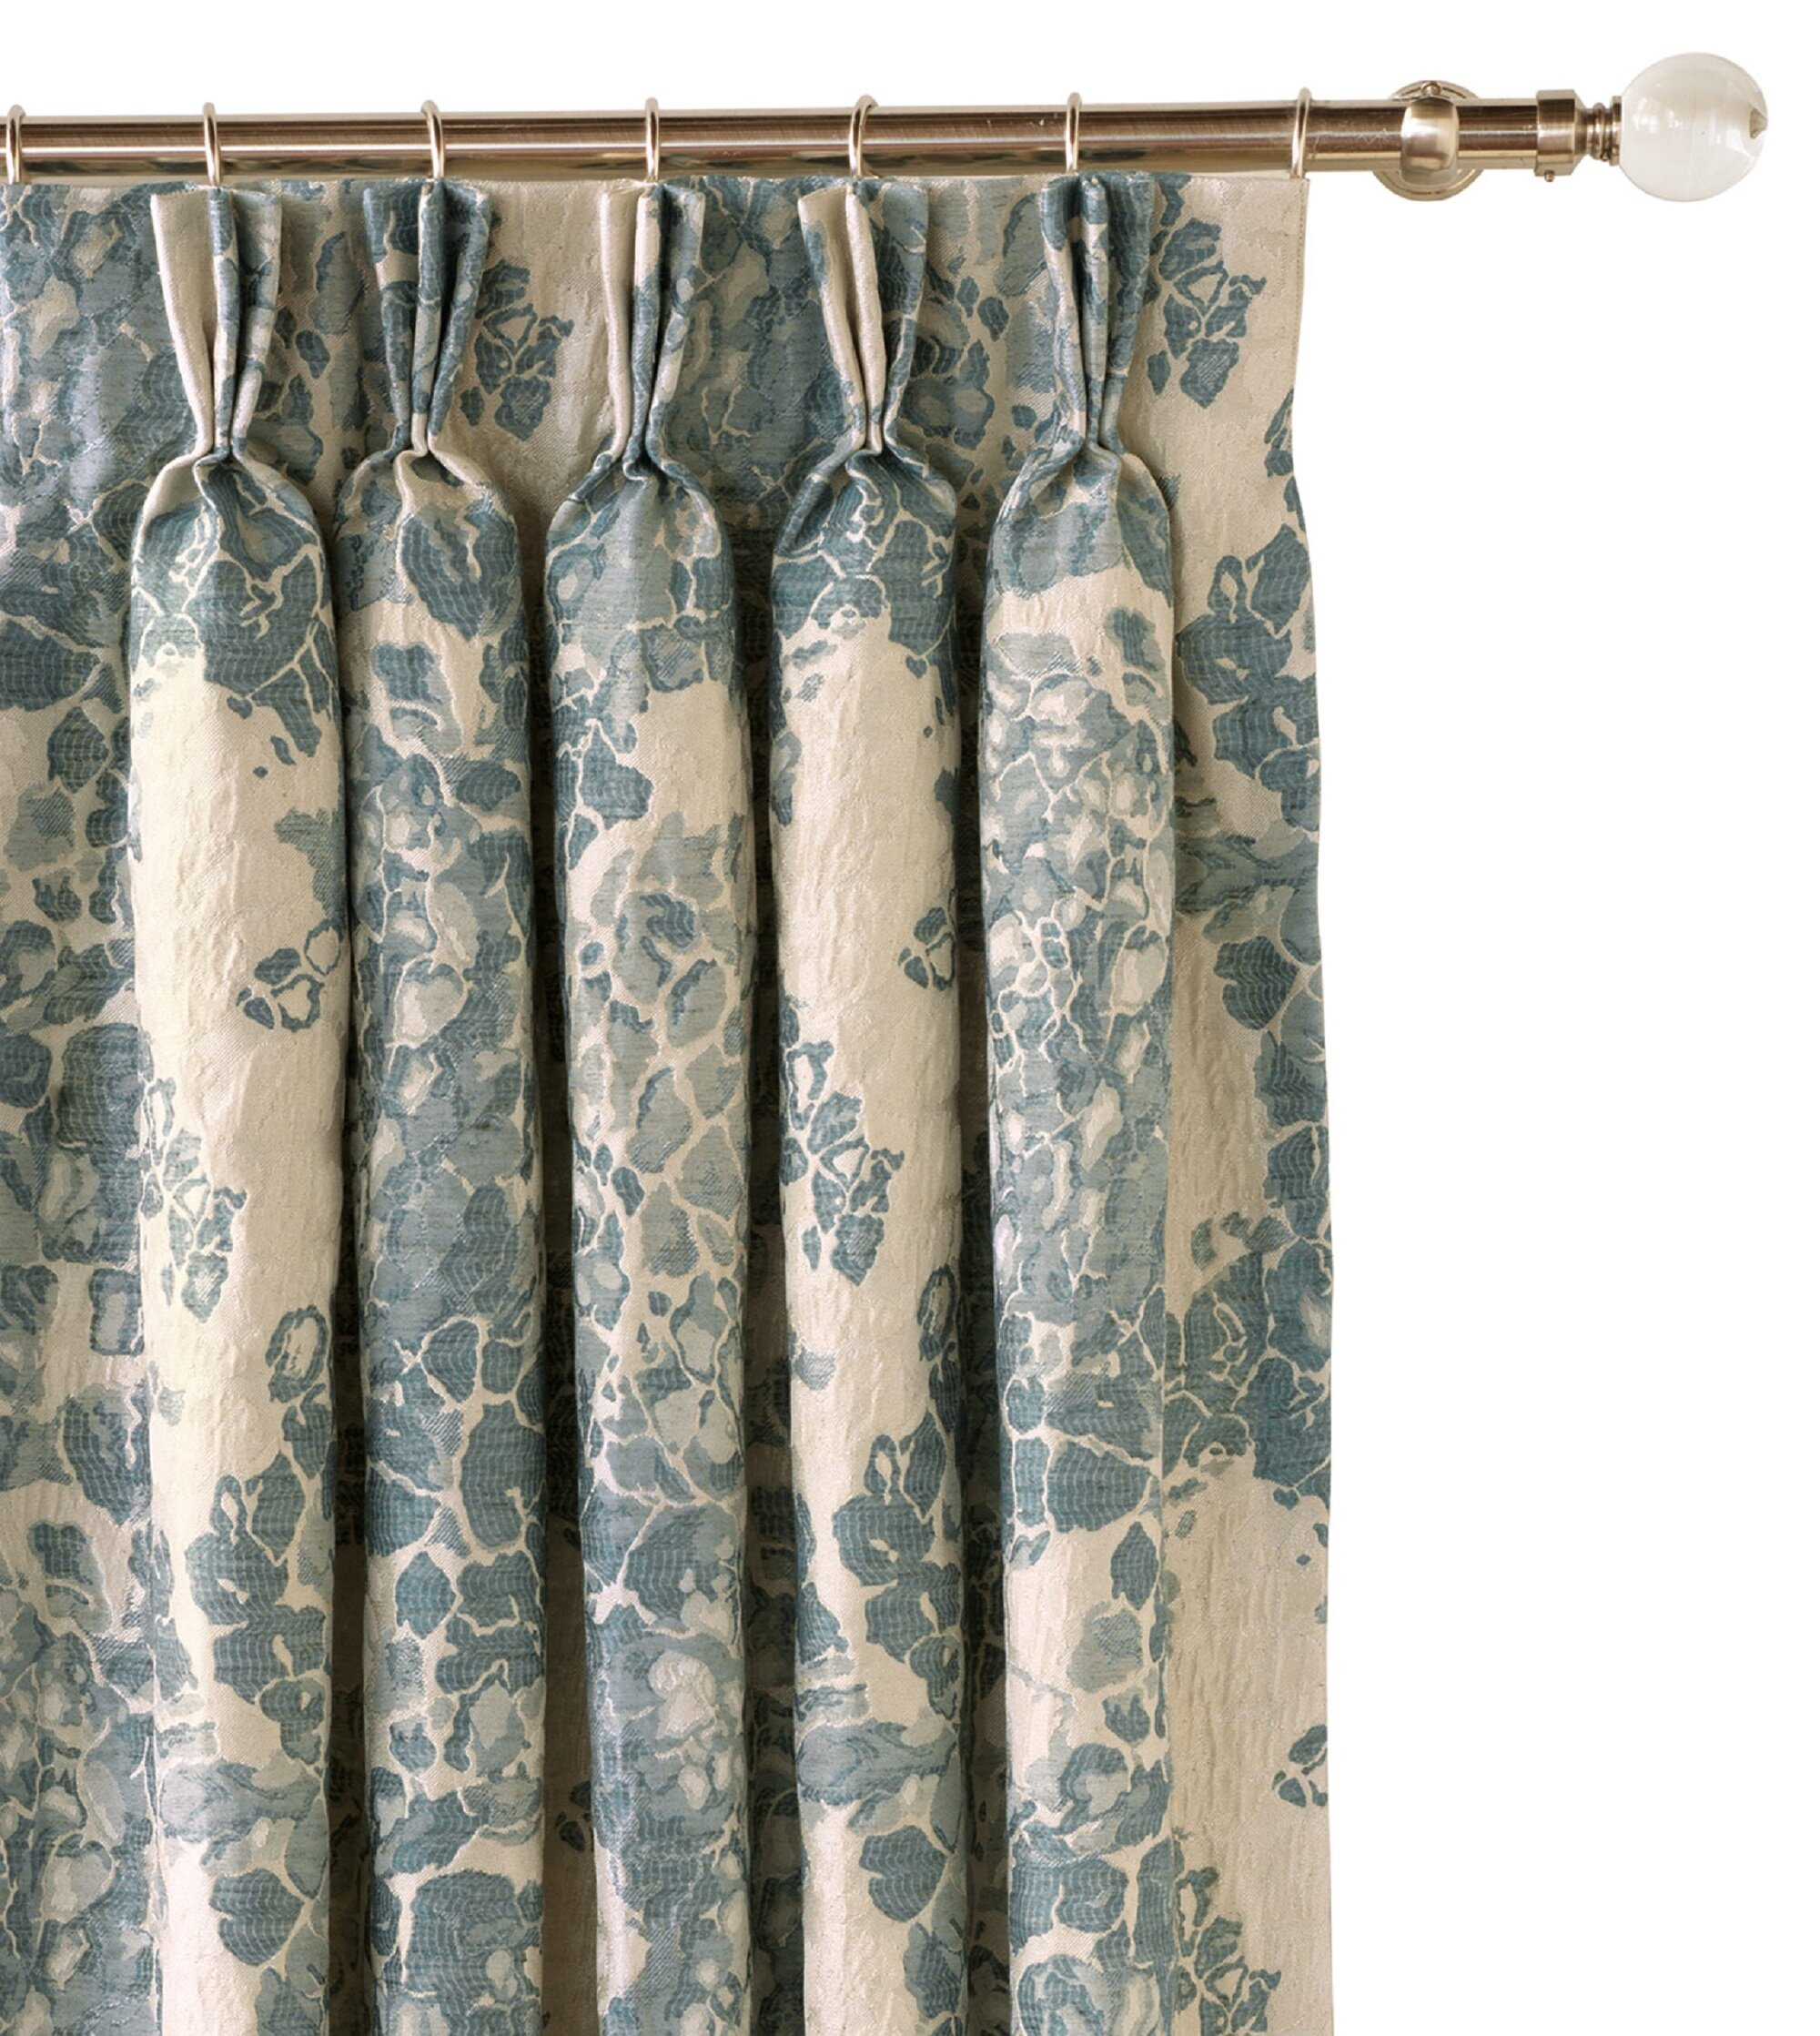 Eastern Accents Luna Floral Room Darkening Pinch Pleat Single Curtain Panel Wayfair Ca